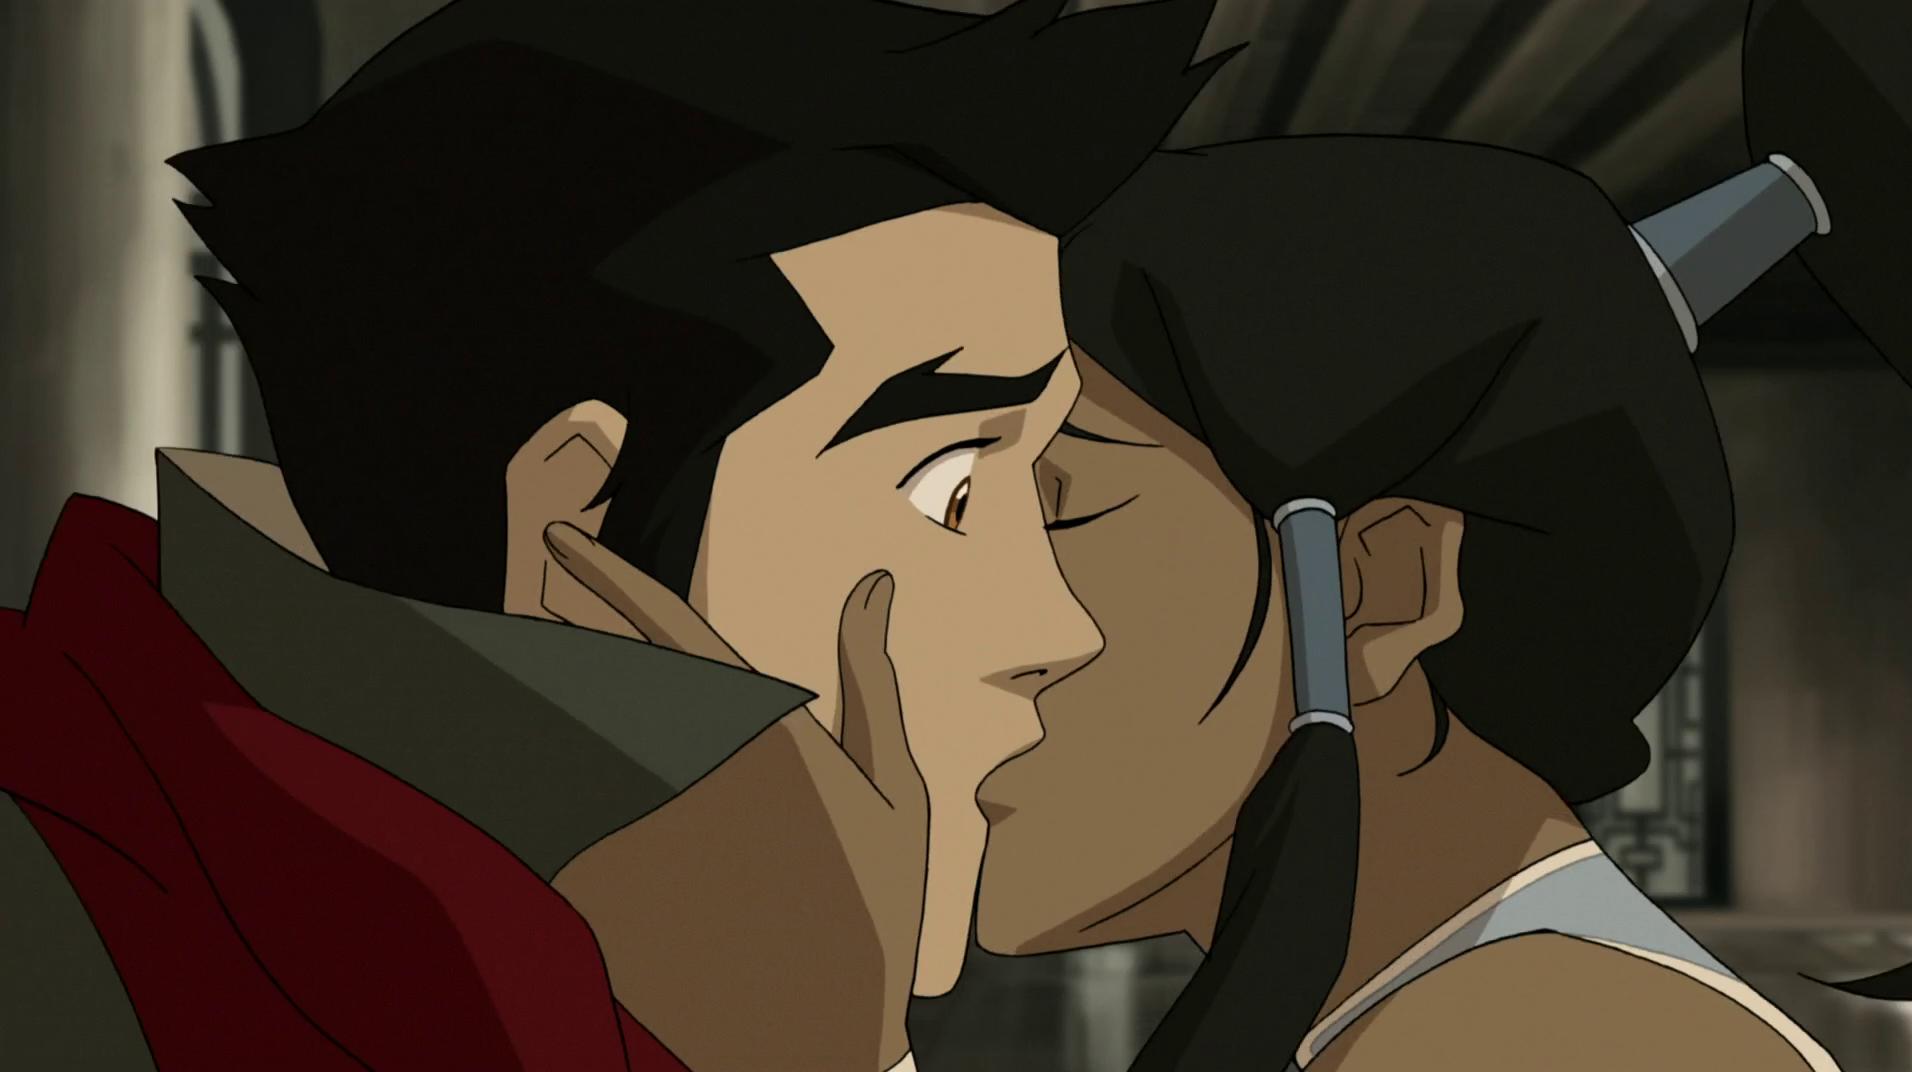 Image korra kisses mako png avatar wiki the avatar the last